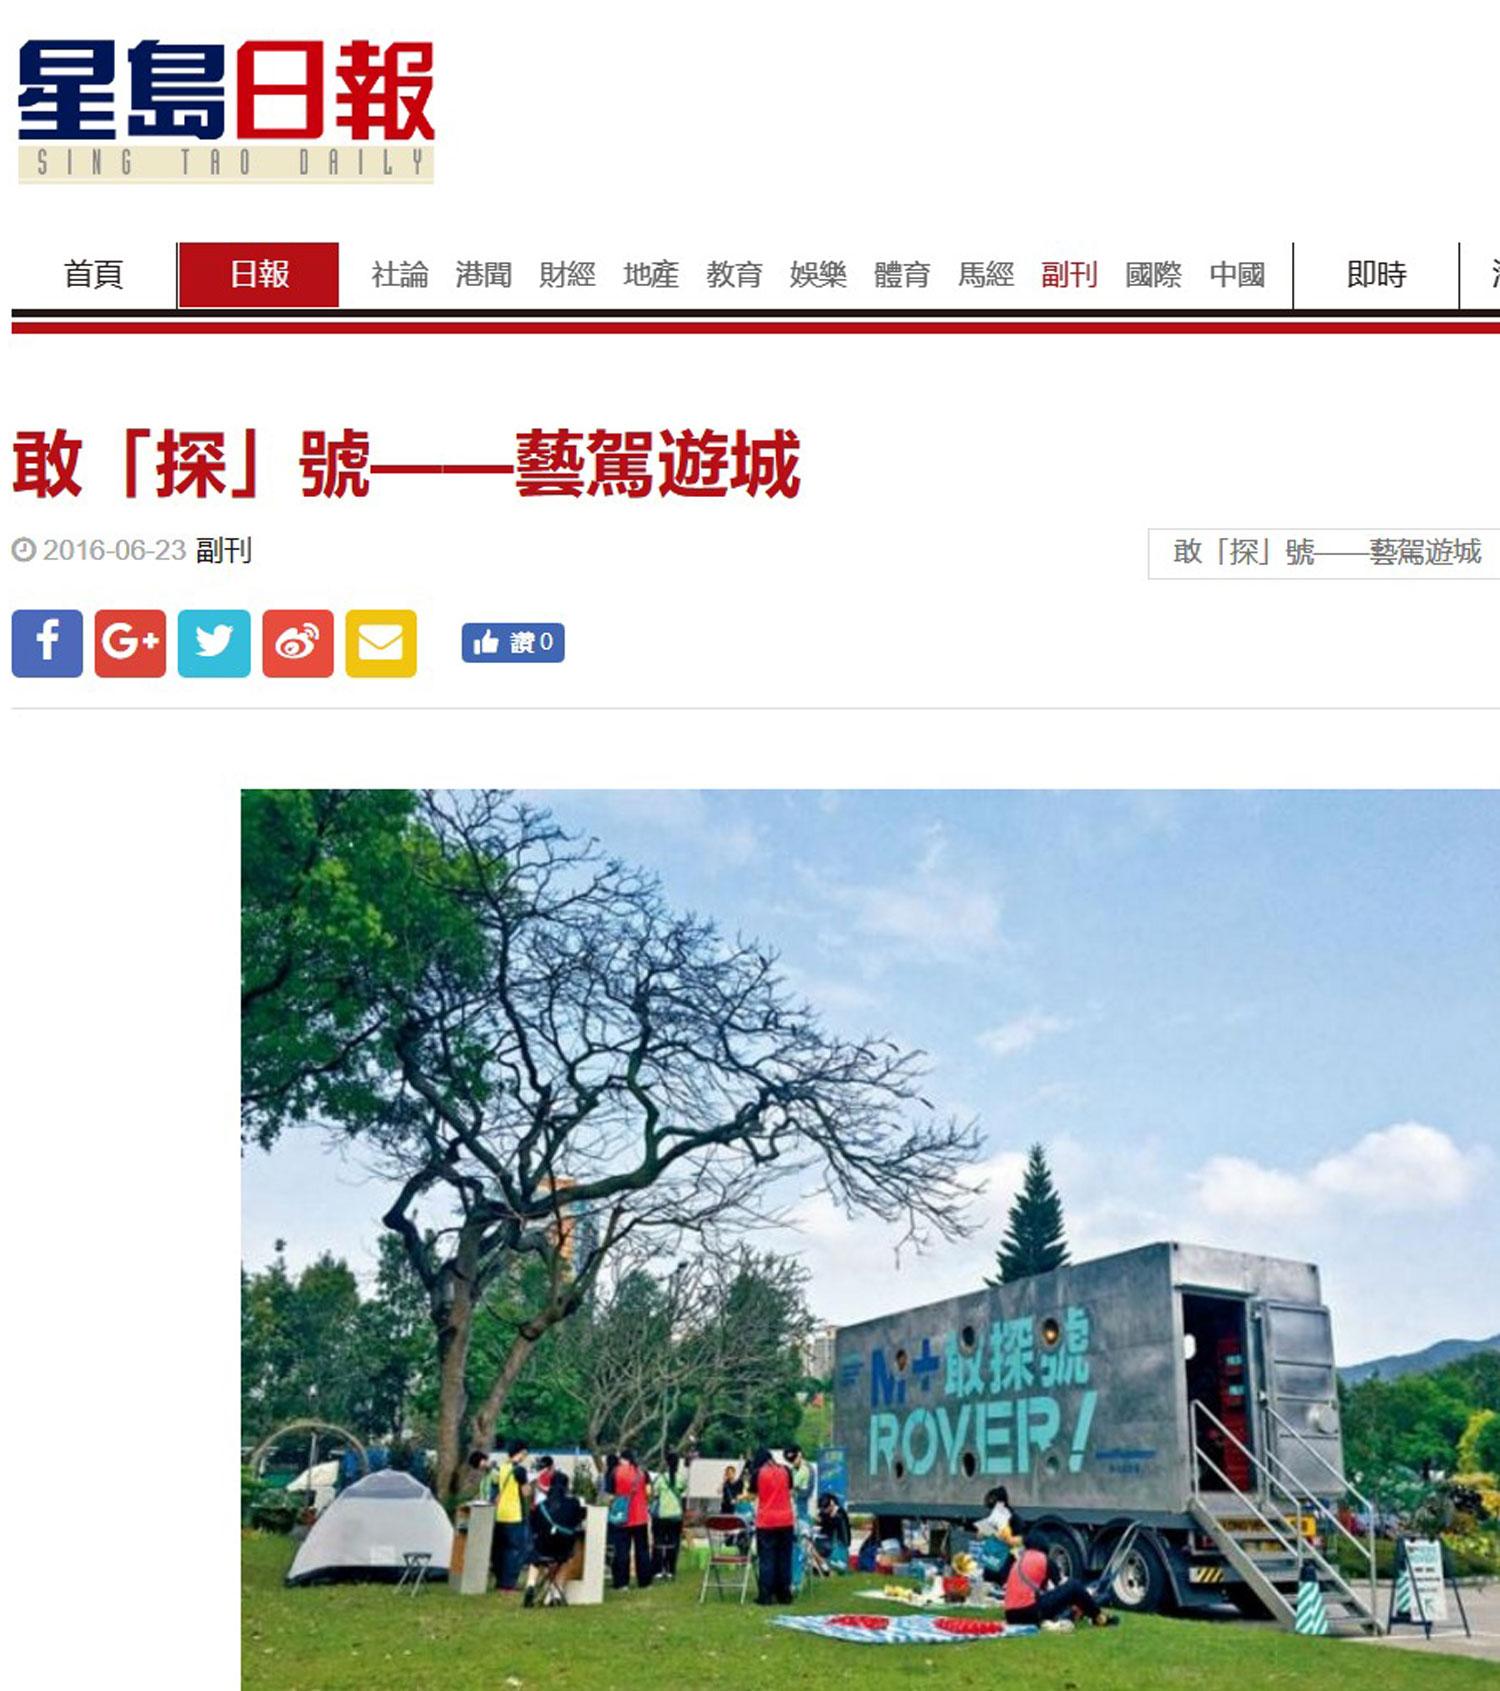 June/23/2016 Sing Tao Daily  M+ Rover - Driving art around town